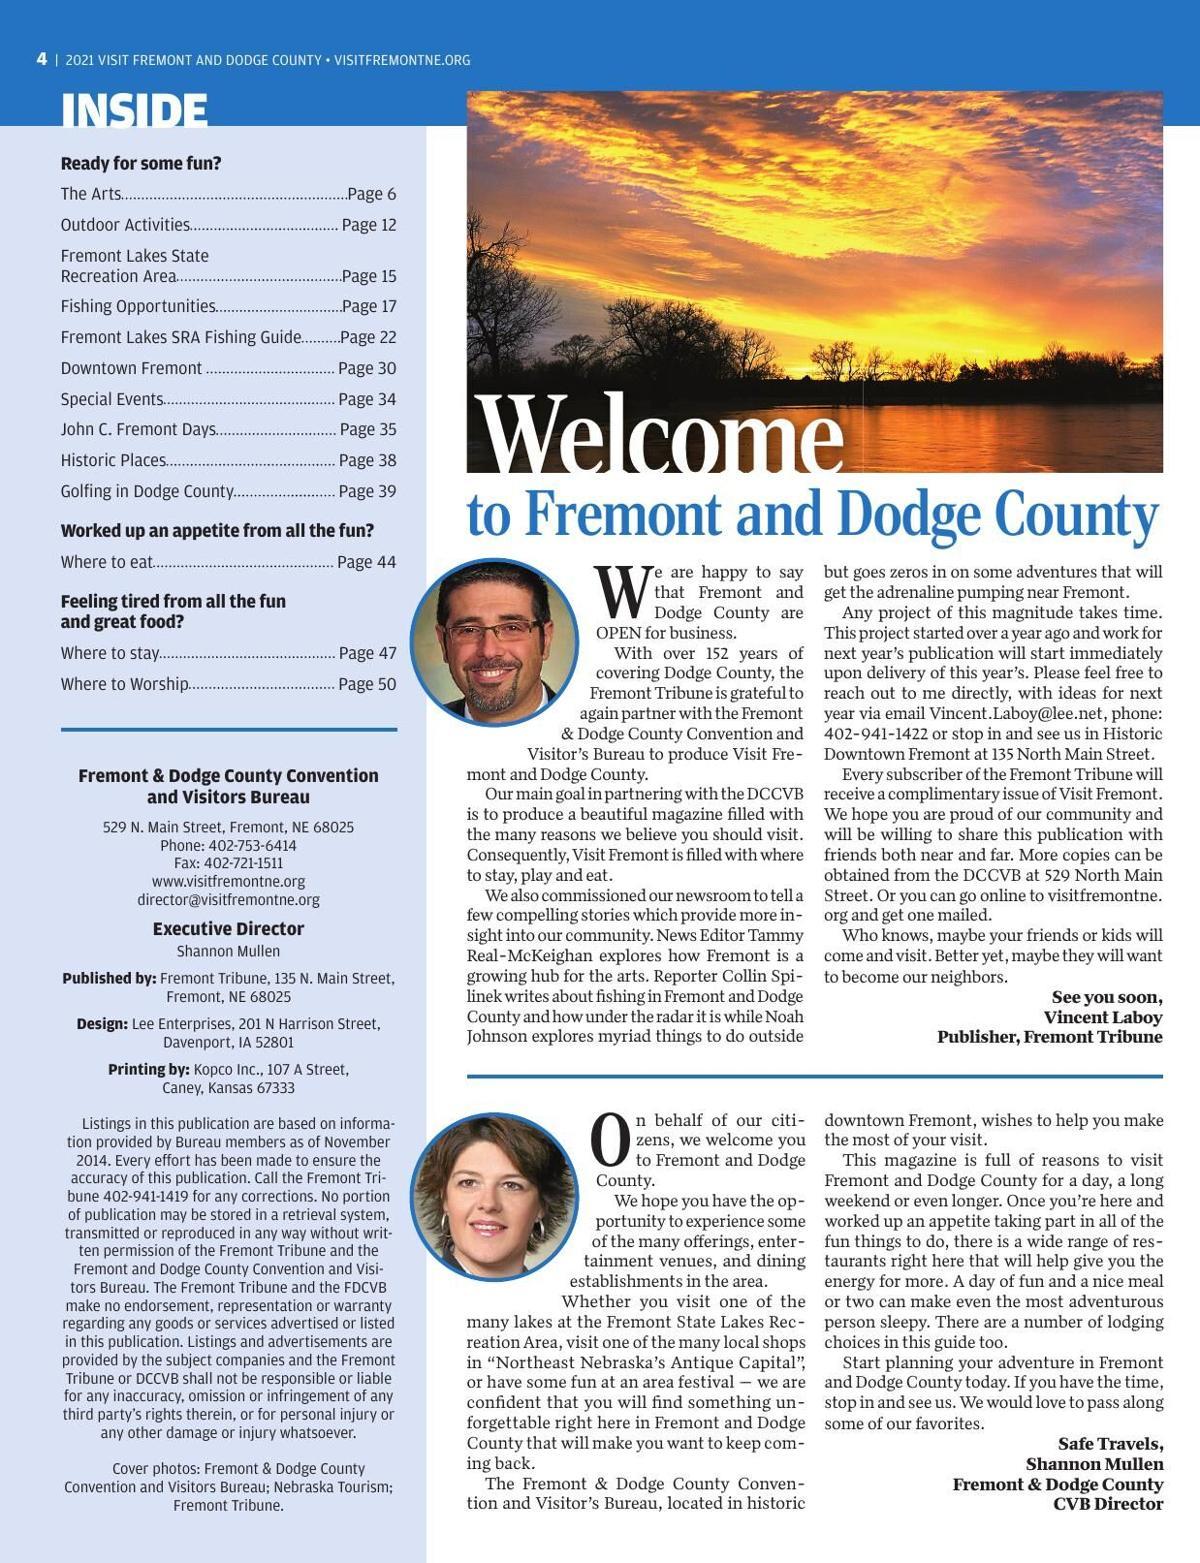 Visit Fremont and Dodge County 2021 4.pdf